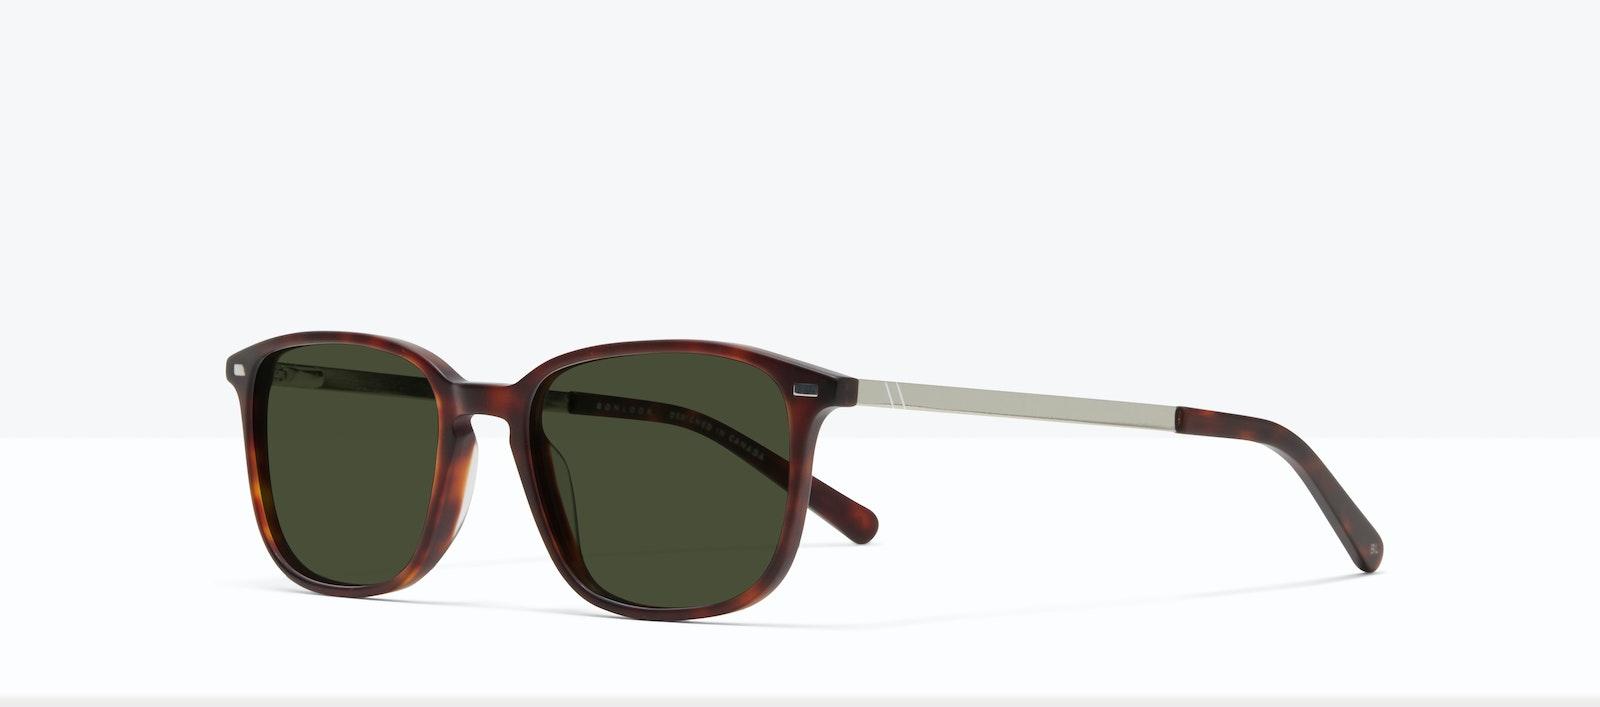 Affordable Fashion Glasses Rectangle Sunglasses Men Sharp L Matte Tort Tilt